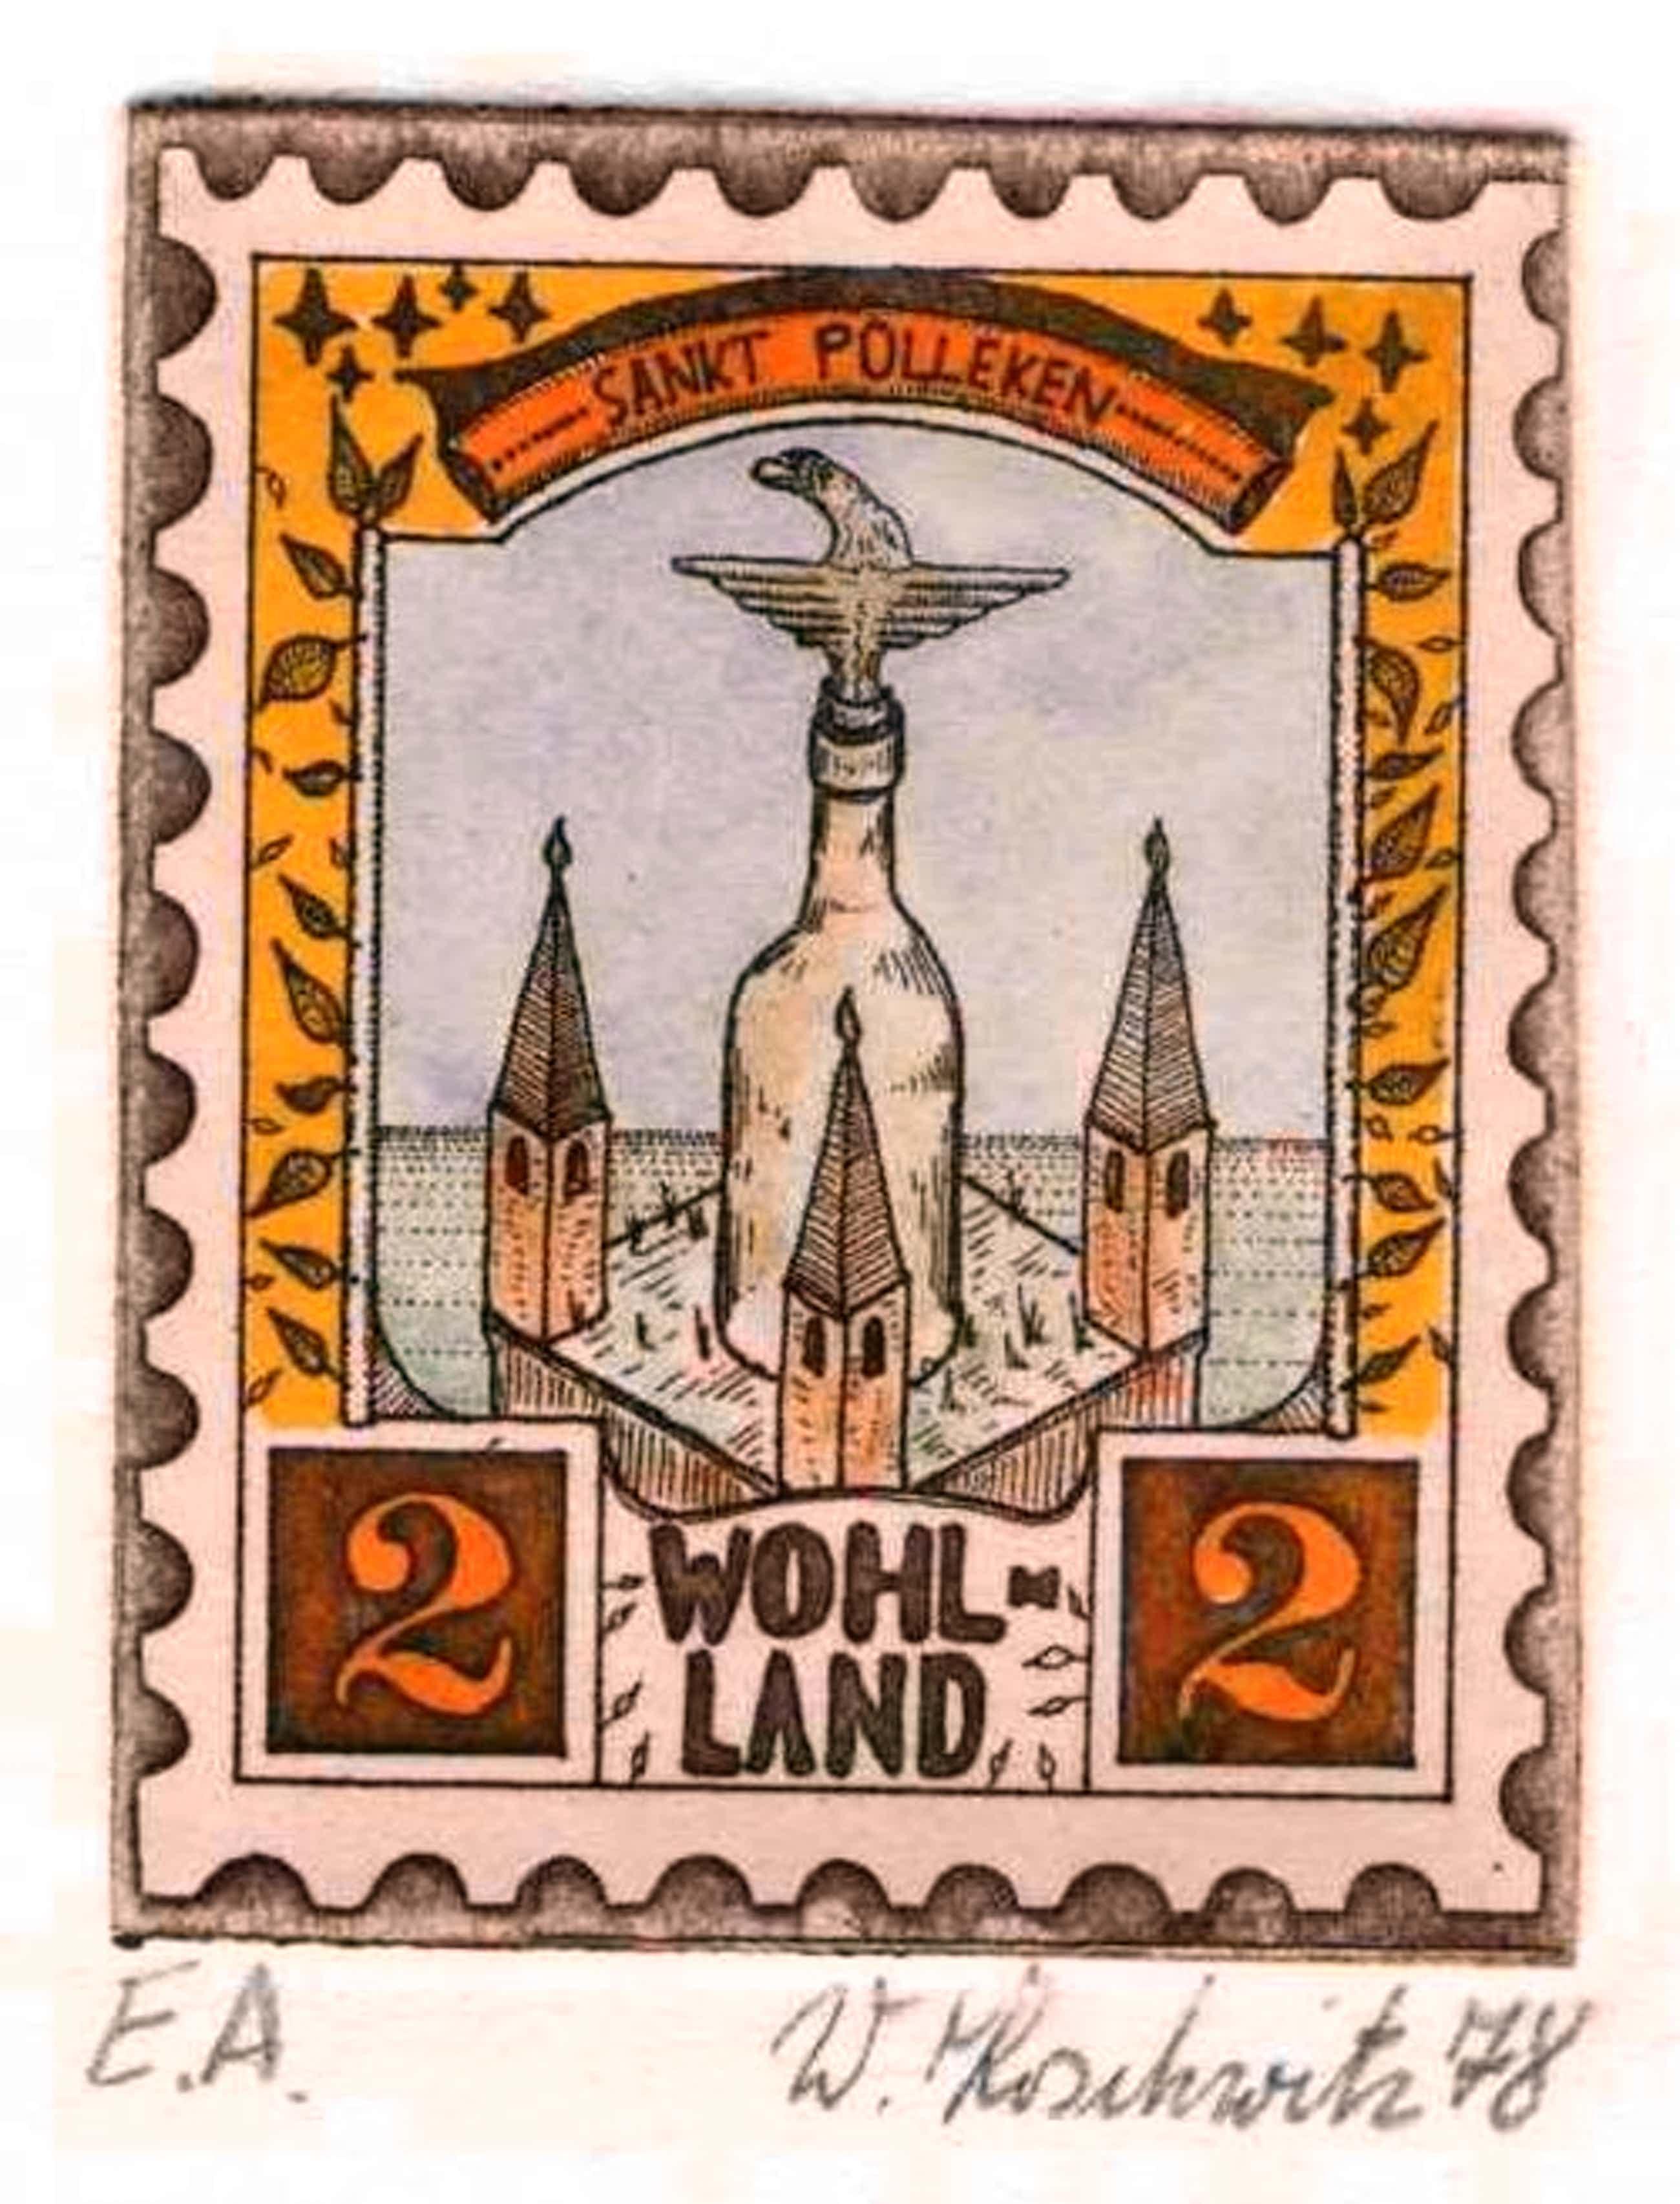 Walter Koschwitz - St. PULLEKEN 1978 - HandSignierte OriginalRadierung des BERLINer KRITISCHEN REALISTENs kopen? Bied vanaf 28!